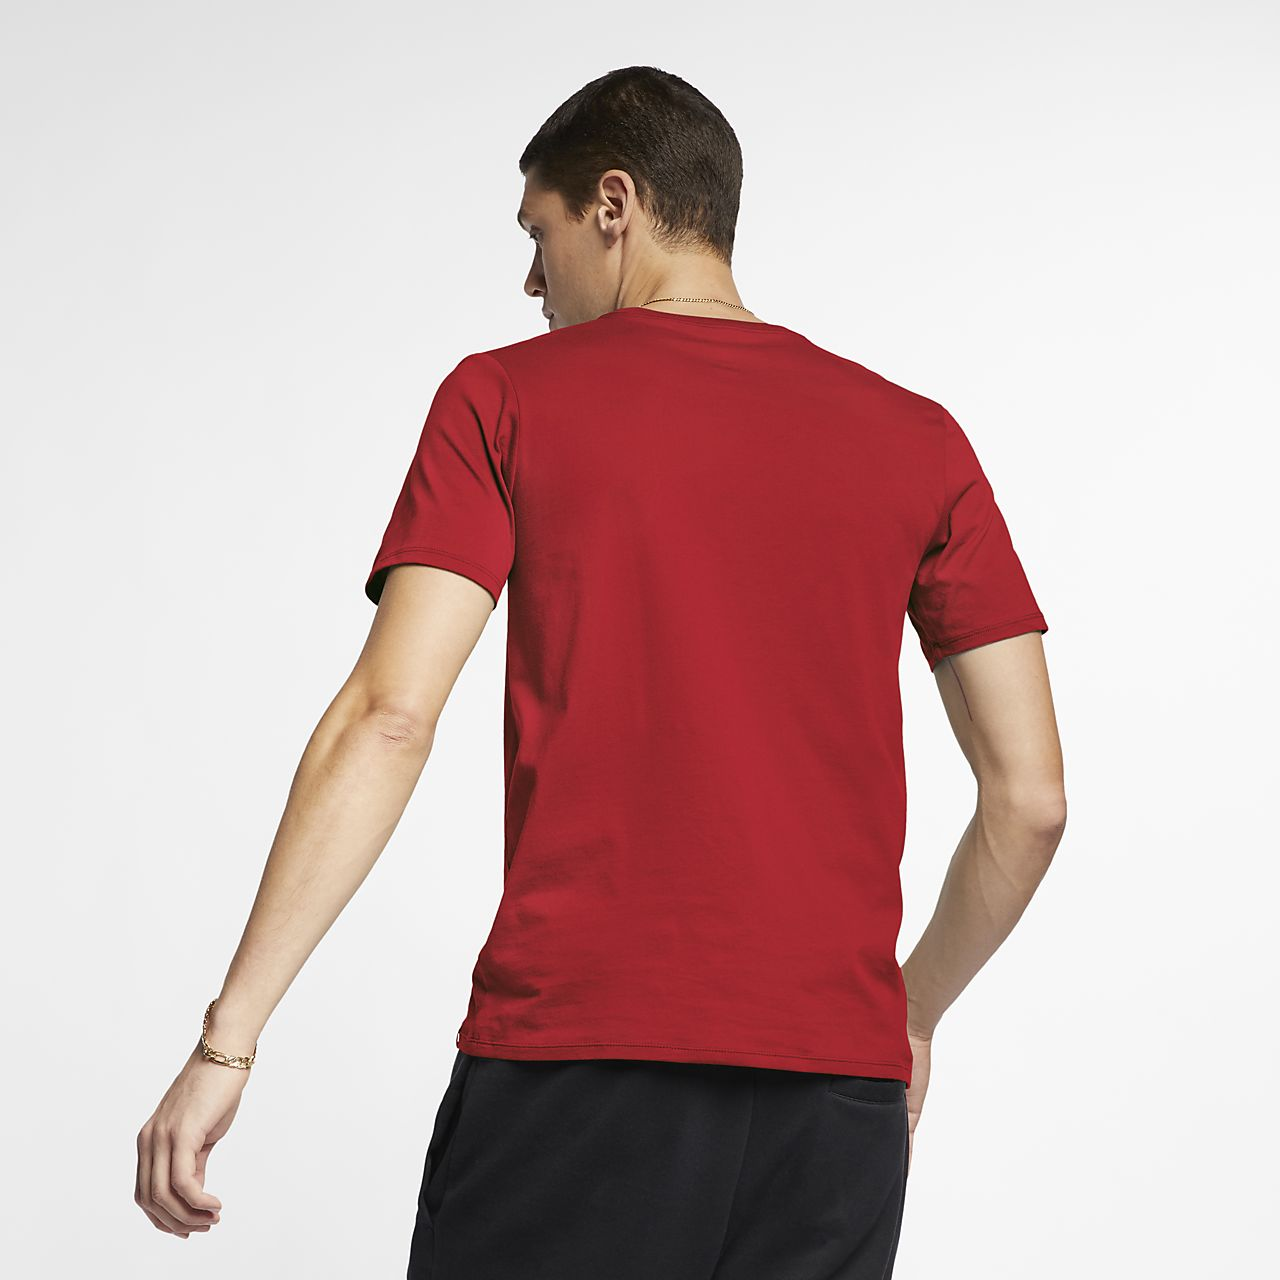 f2ff35eac55163 Jordan Sportswear Jumpman Air Men s T-Shirt. Nike.com SG